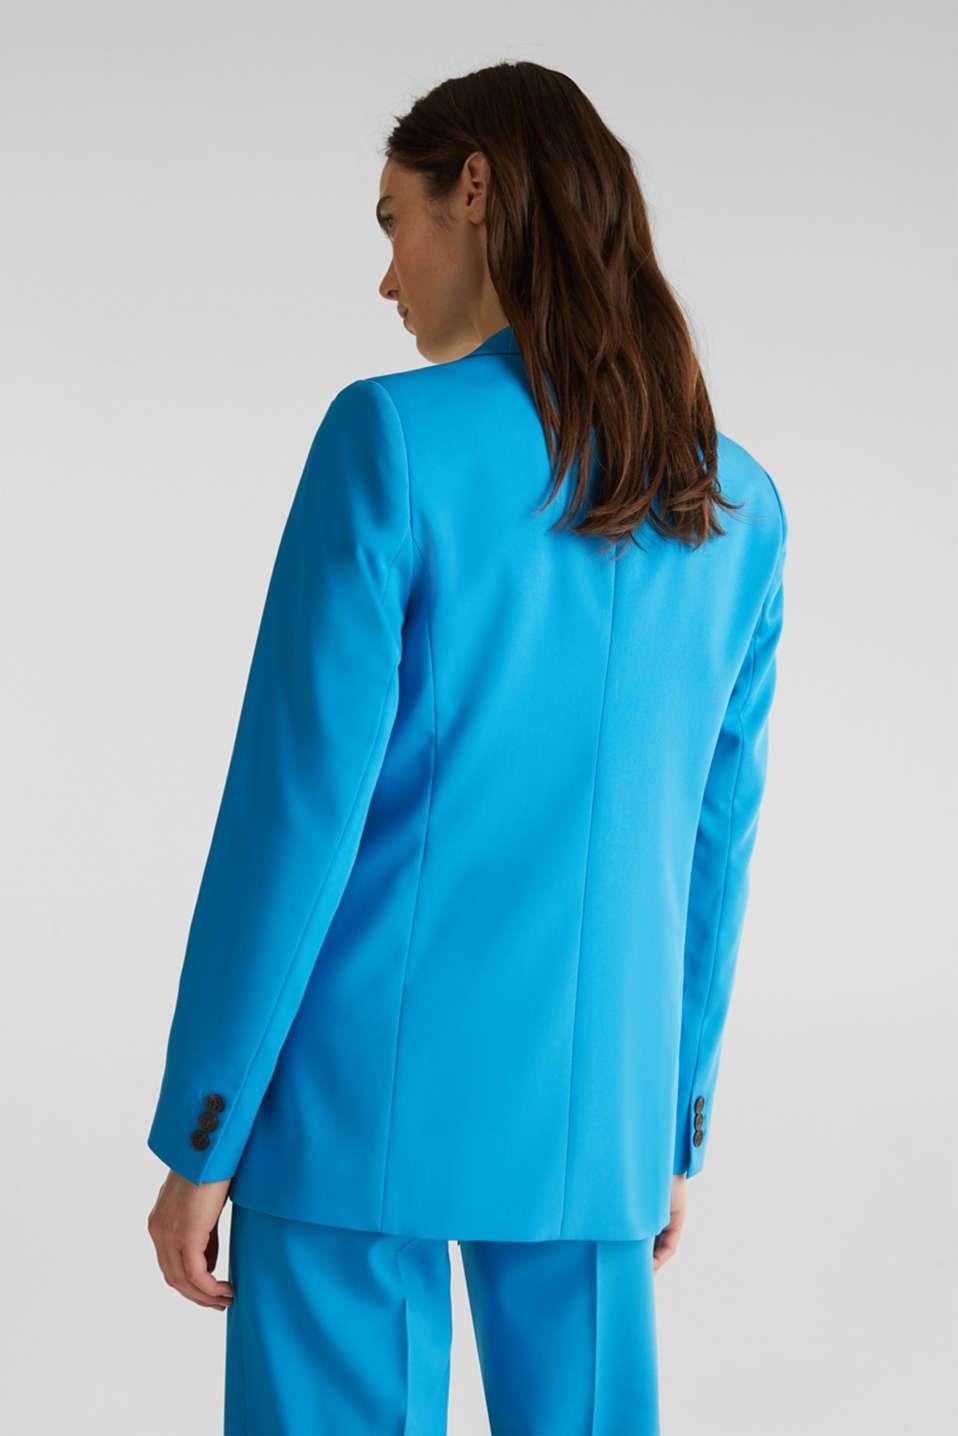 SHIMMER mix + match stretch blazer, DARK TURQUOISE, detail image number 3